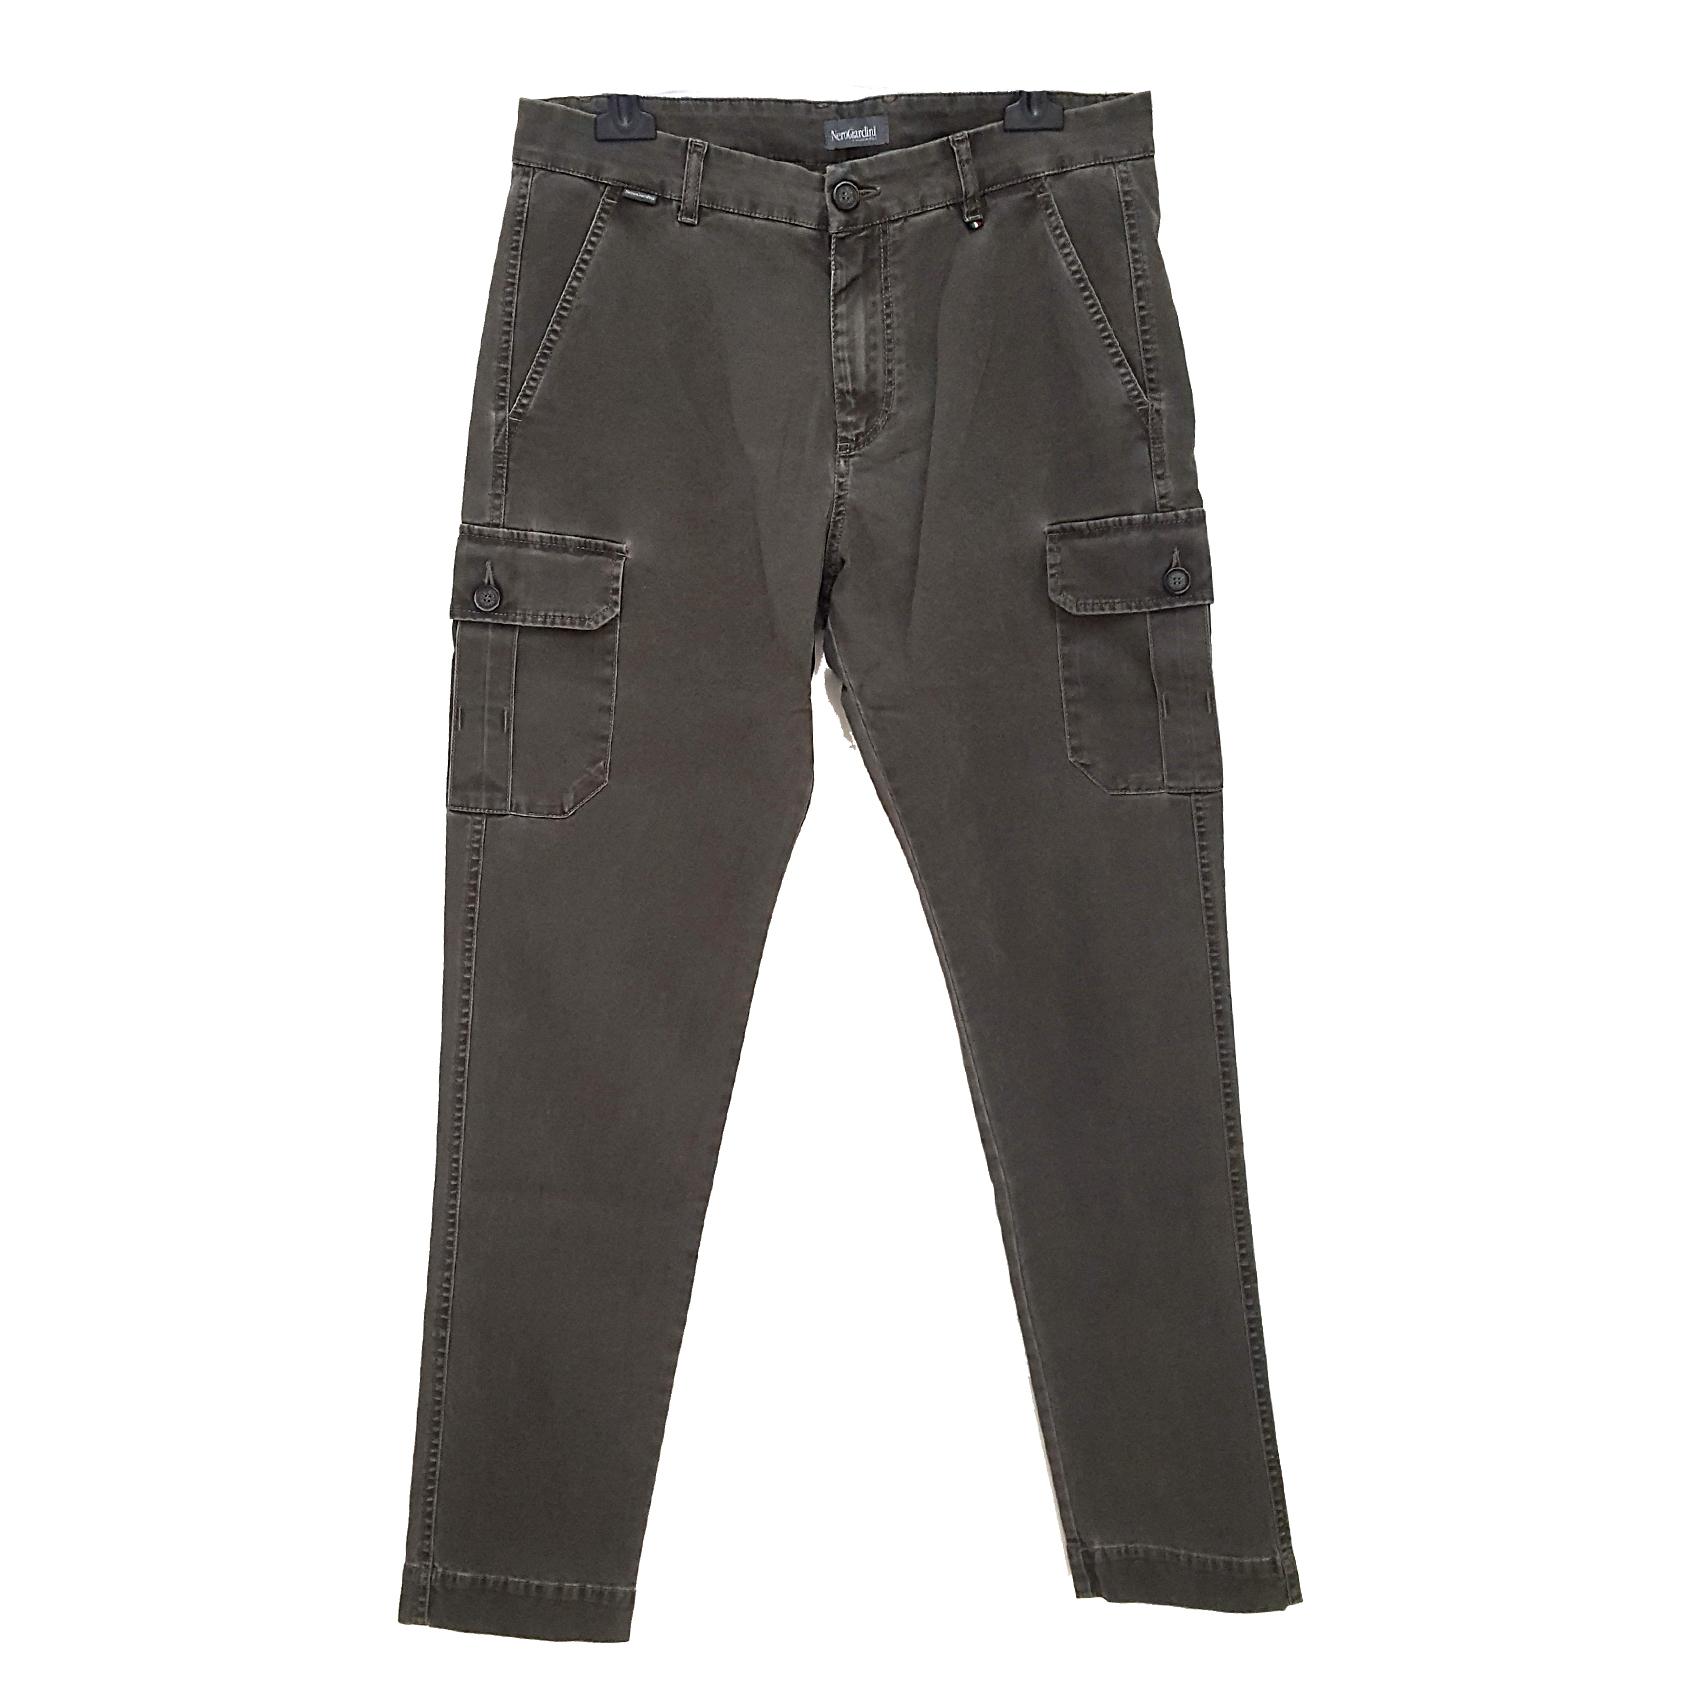 Pantalone bosco con tasconi Nero Giardini